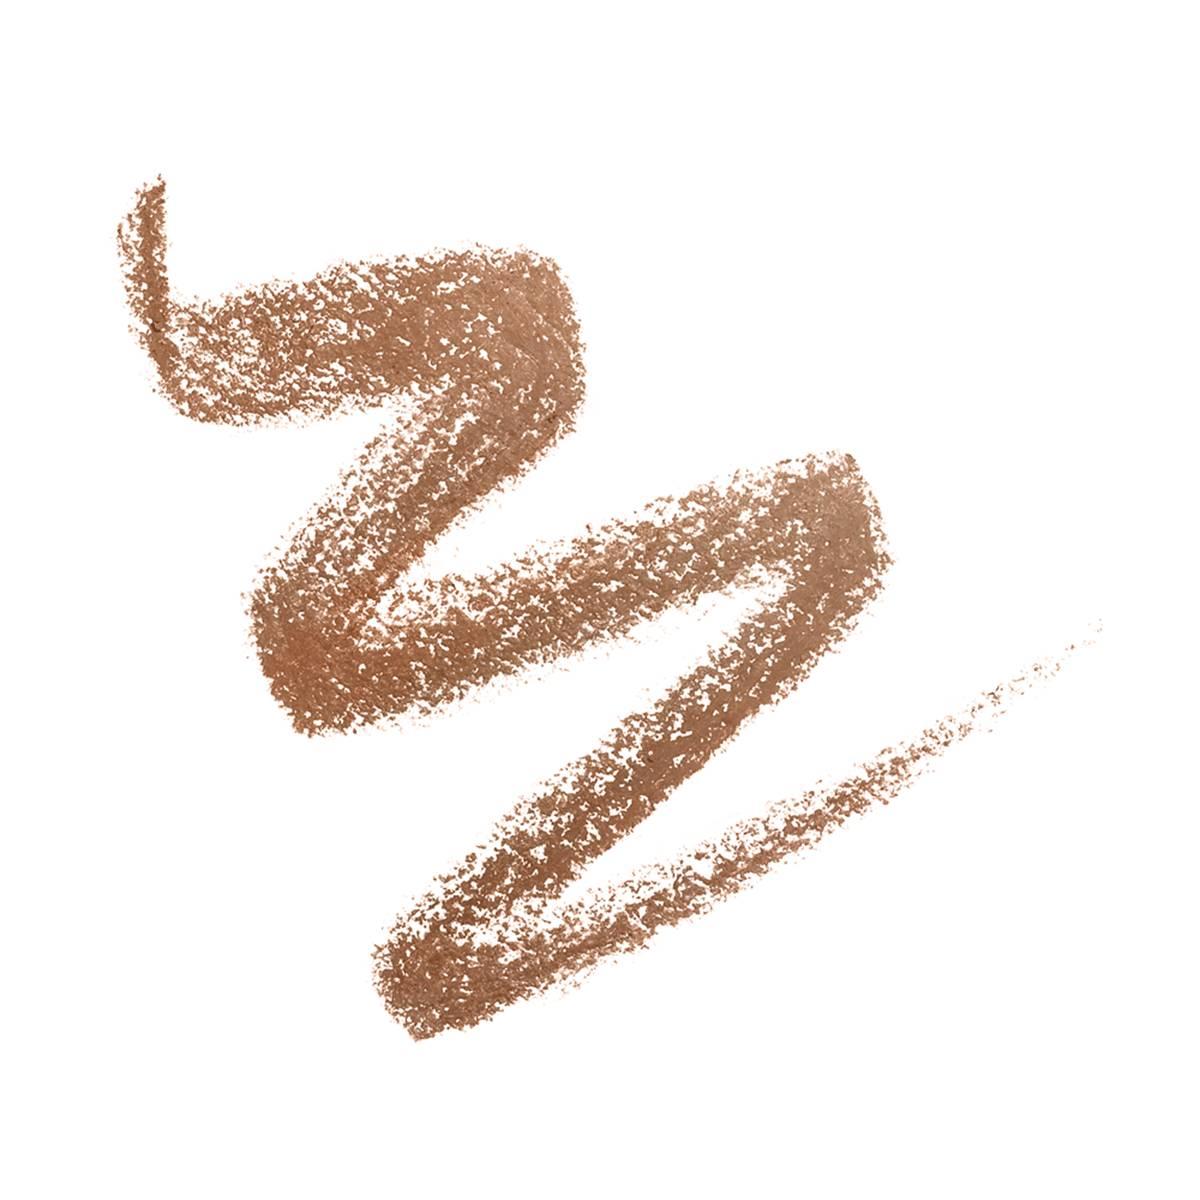 La Roche Posay Sensitive Toleriane Make up EYEBROW_PENCIL Blond 333787